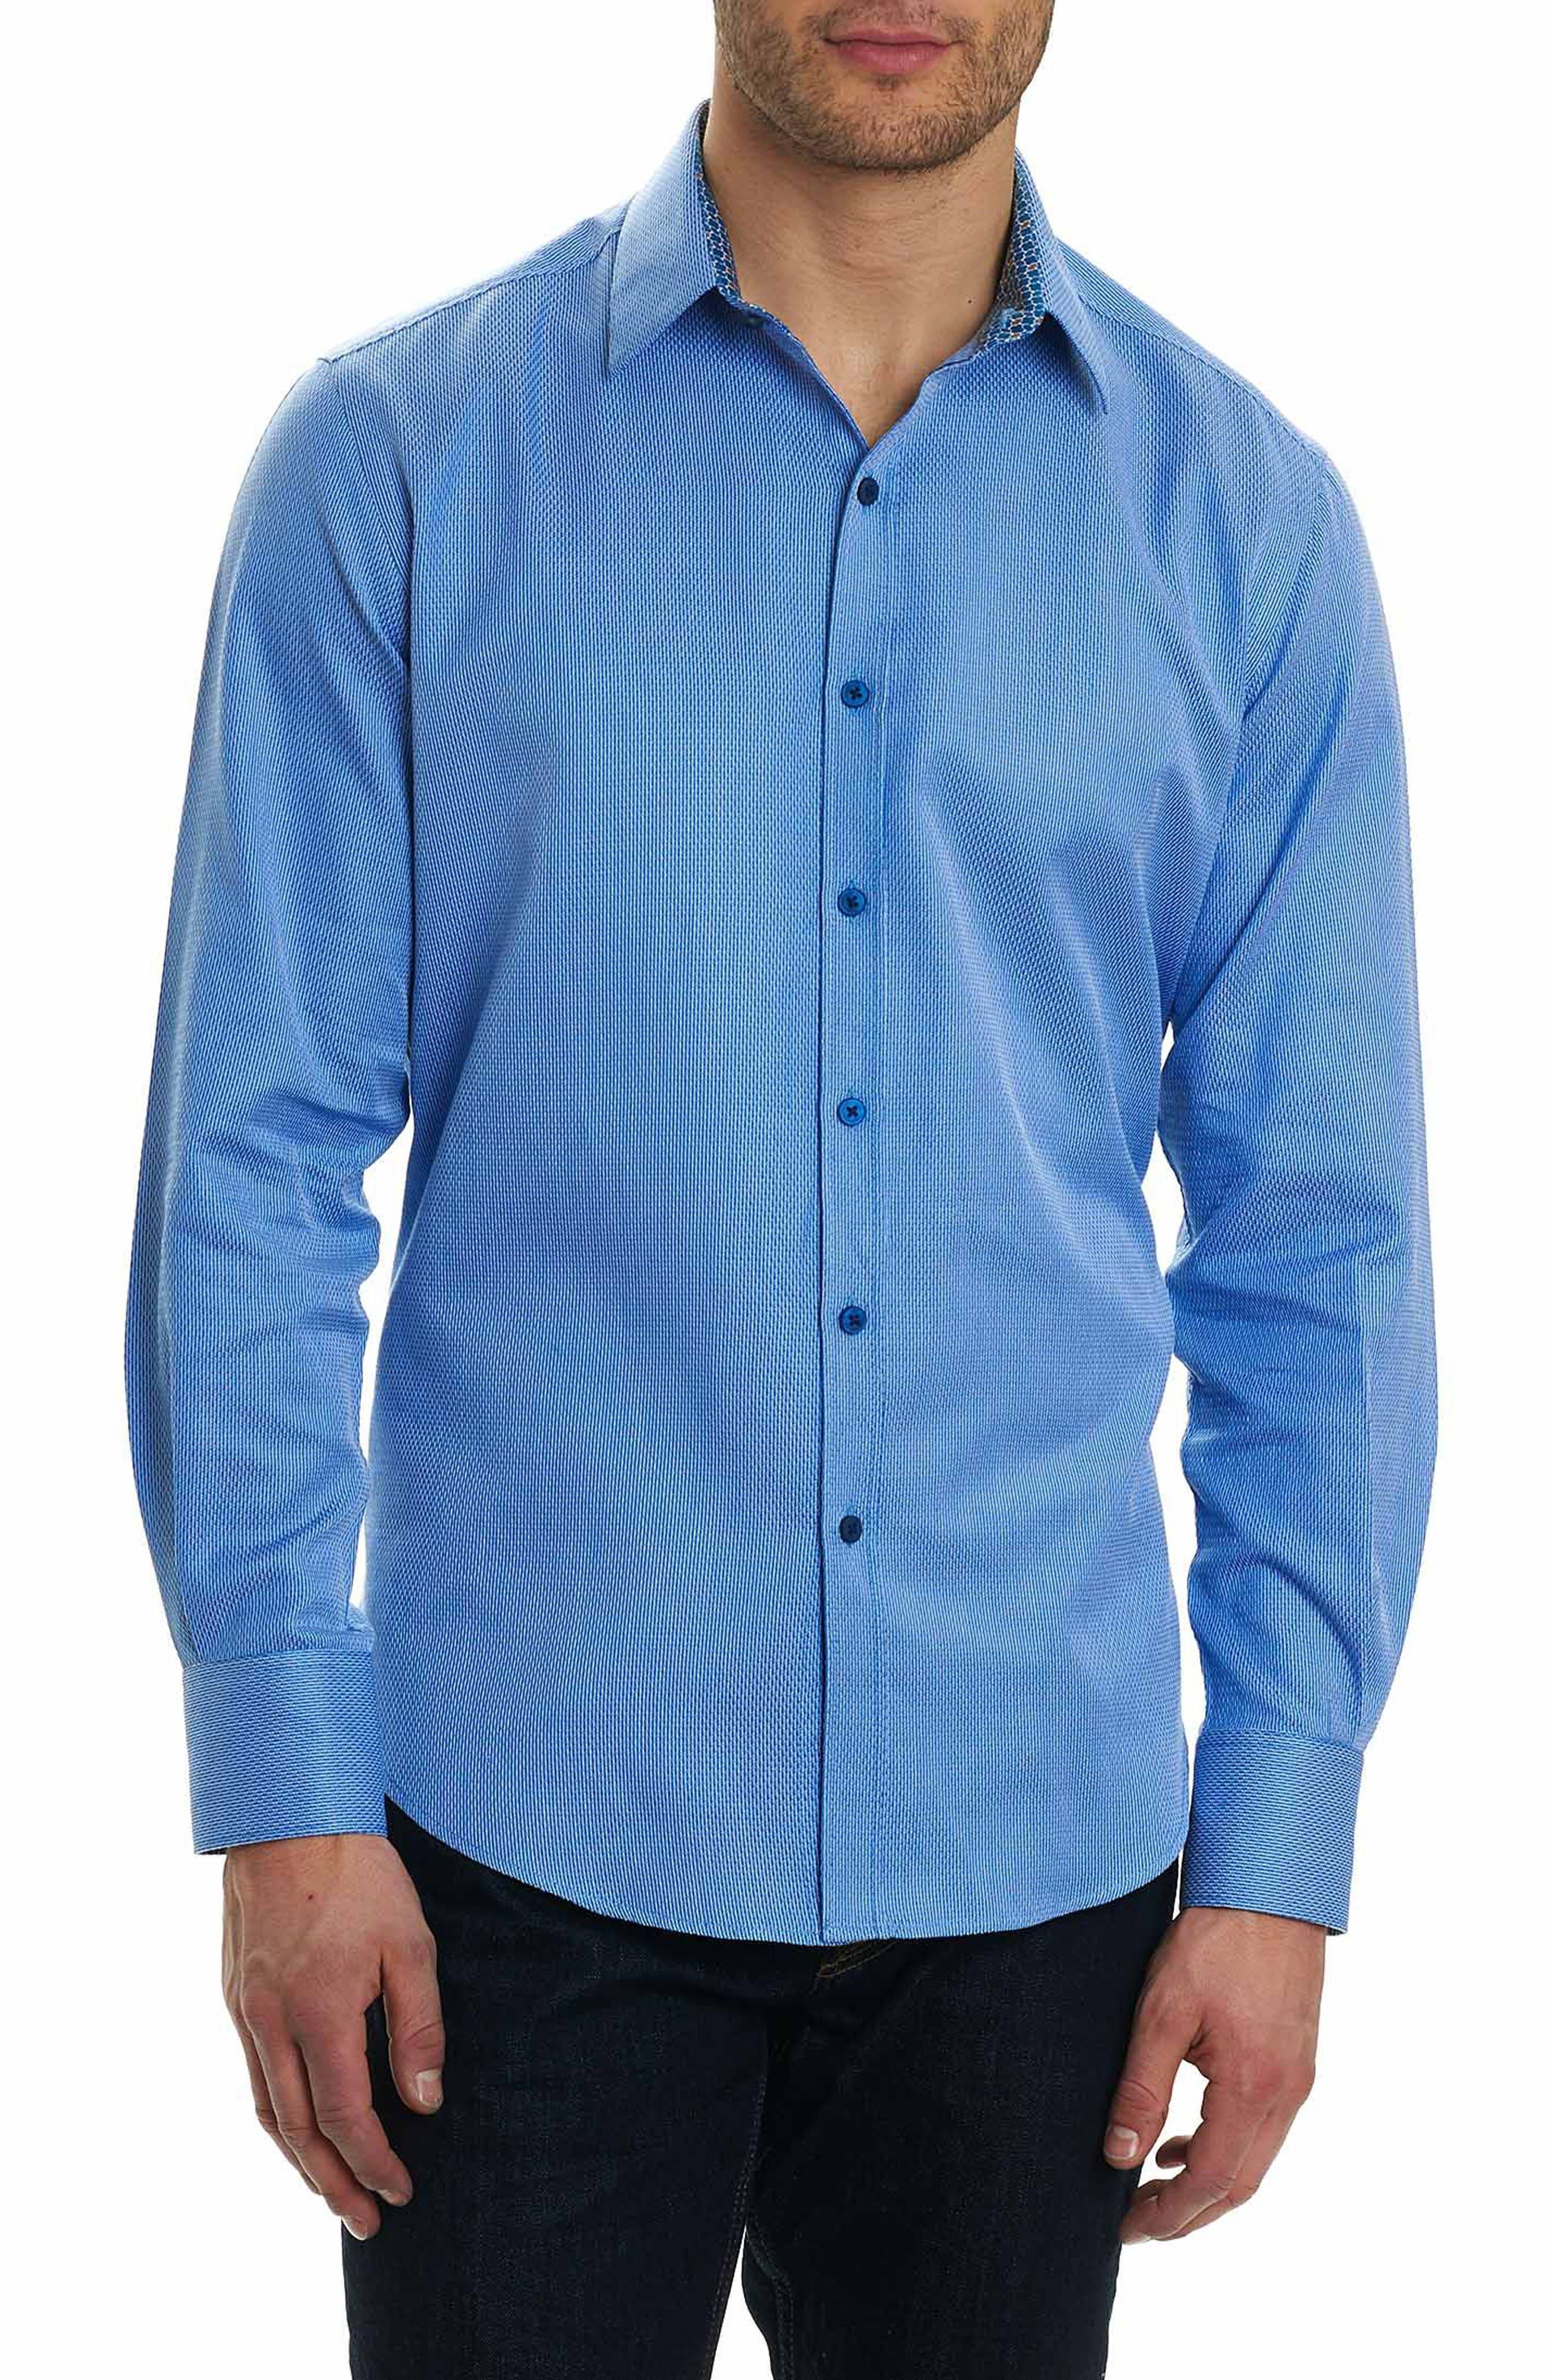 Jobson Regular Fit Sport Shirt,                             Main thumbnail 1, color,                             400